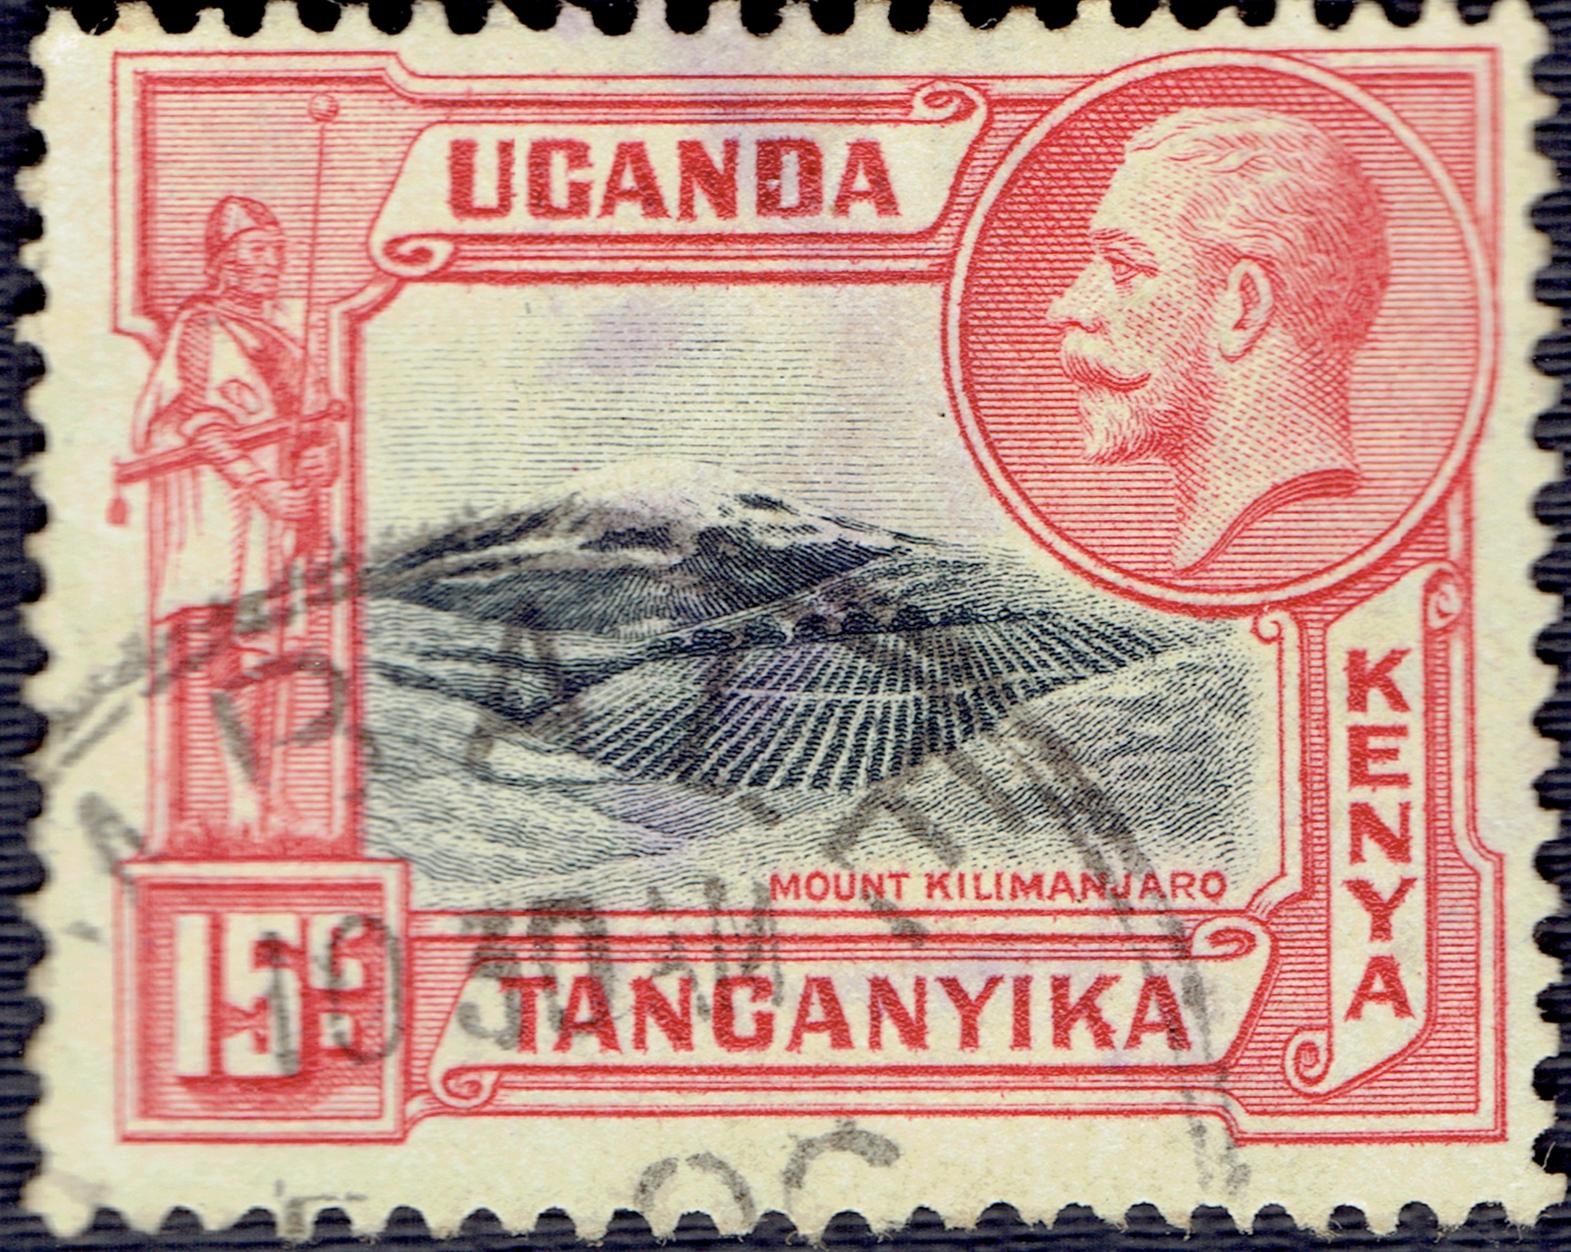 Kenya, Uganda & Tanganyika - Scott #49 (1935)